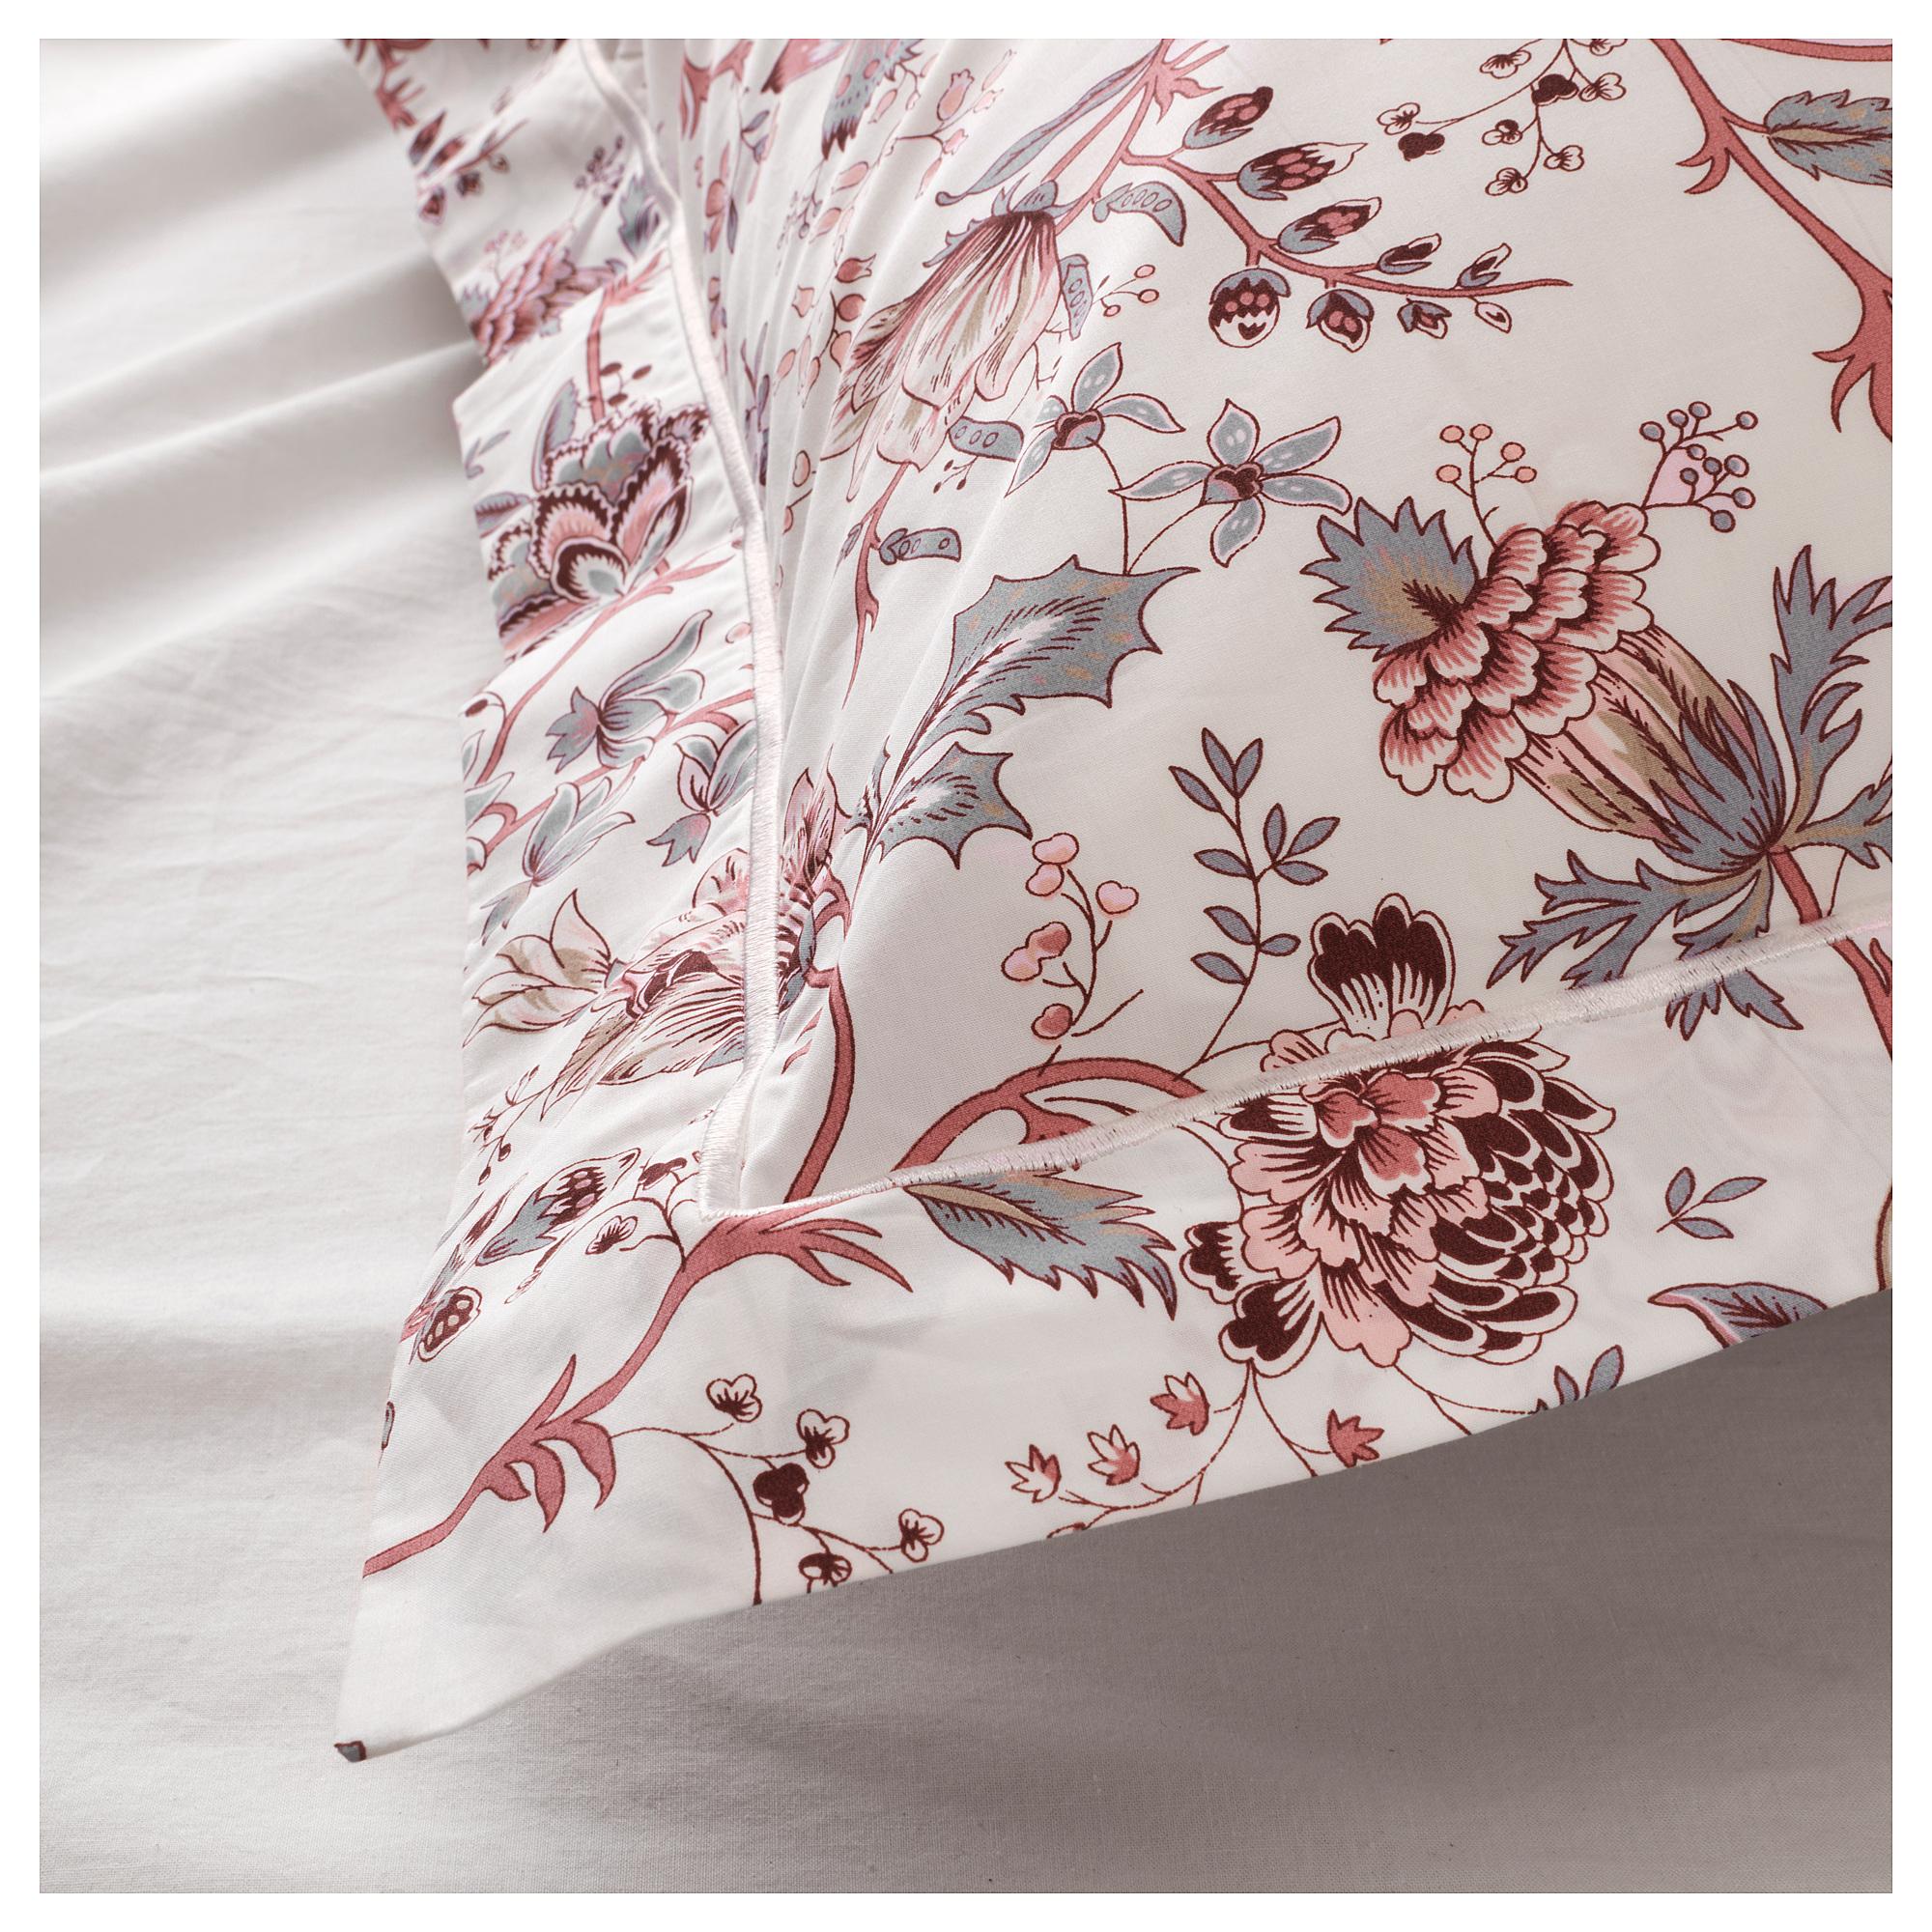 Ikea Sprangort Duvet Cover And Pillowcase S White Pink